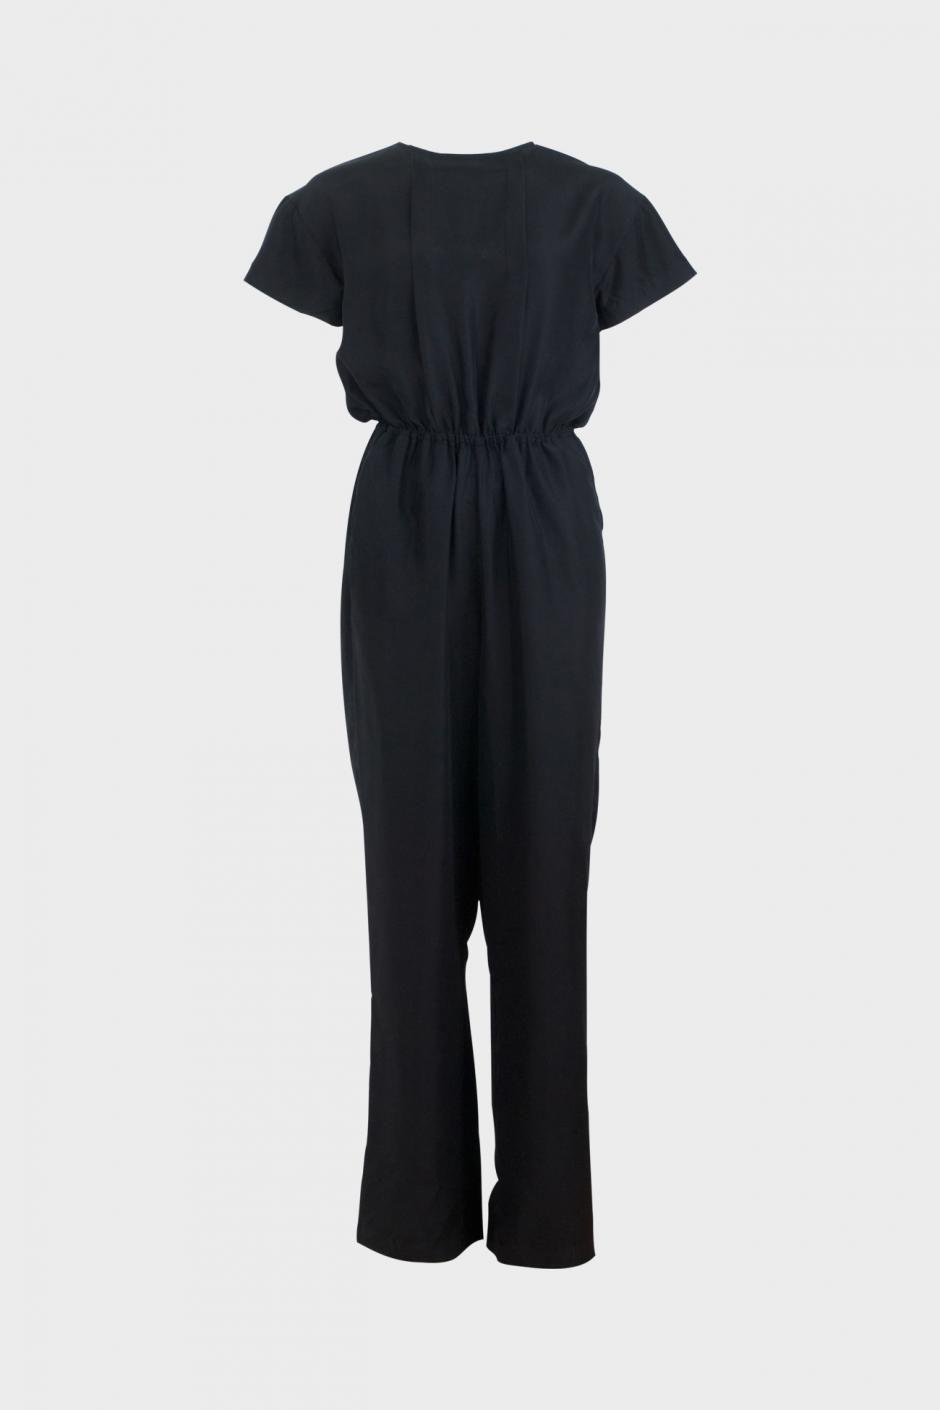 278b1d7a Wood Wood - Brigitte Jumpsuit 11731400-1119 | Wear